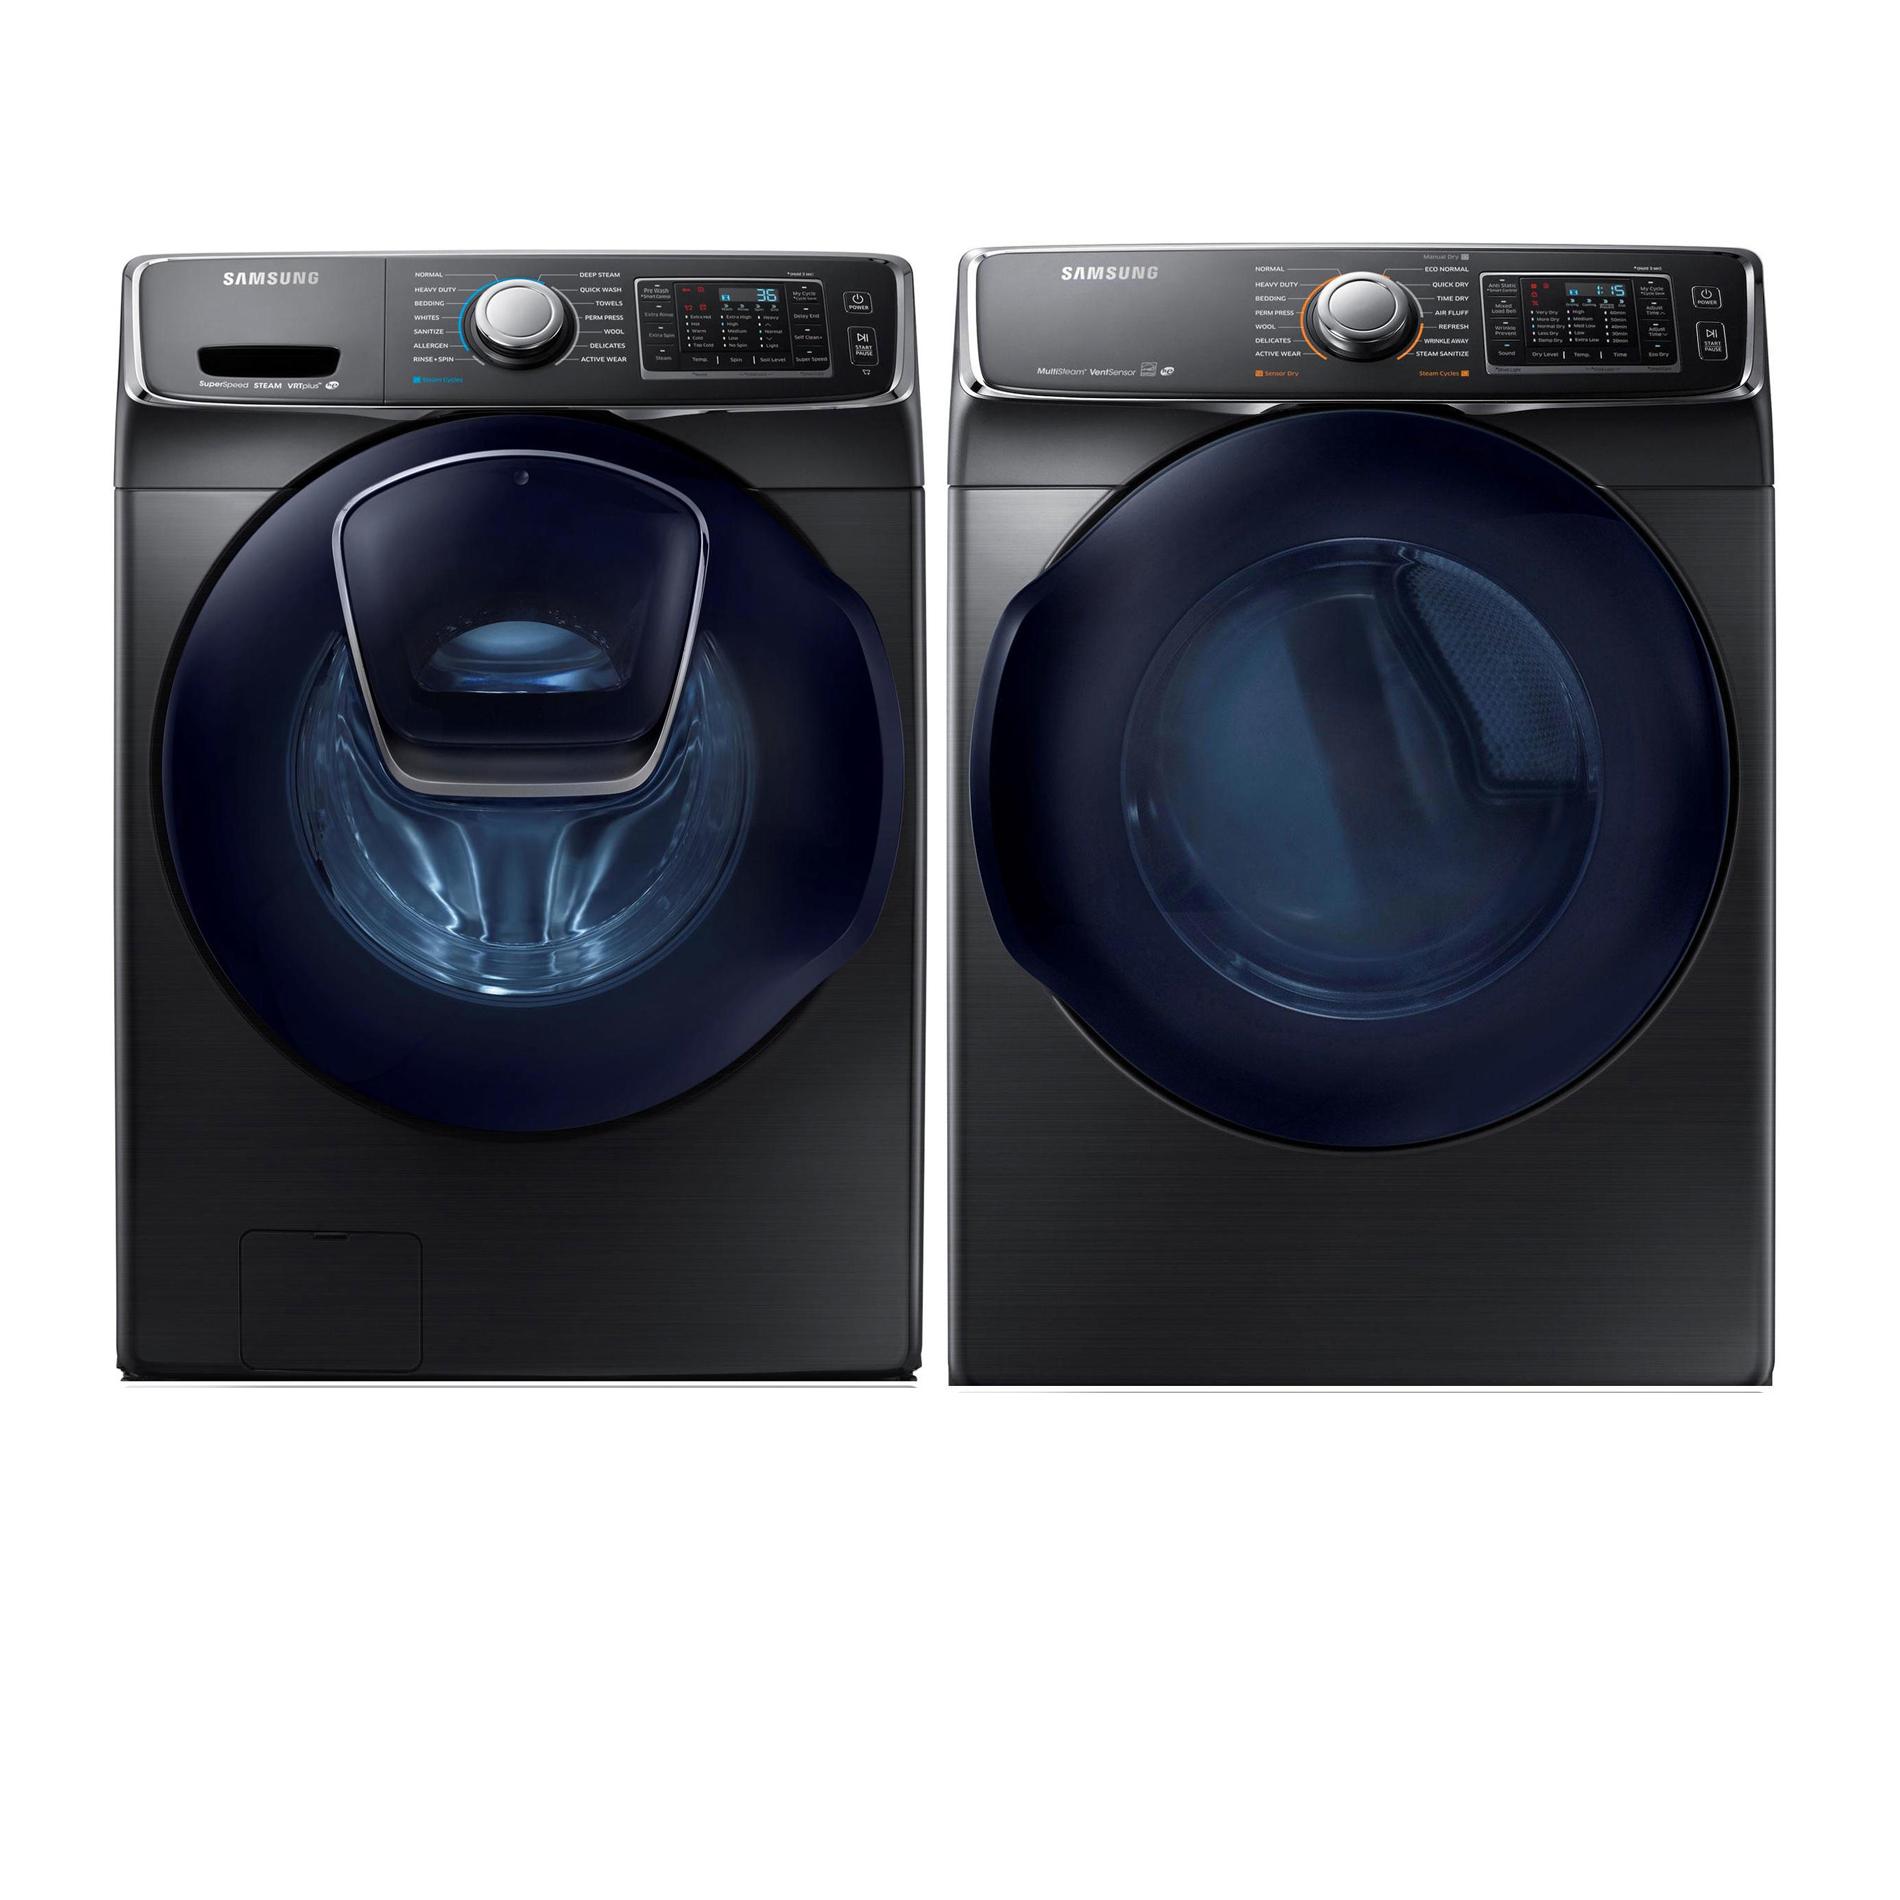 4.5 cu. ft. AddWash™ Front Load Washer and 7.5 cu. Ft Dryer Bundle - Black Stainless